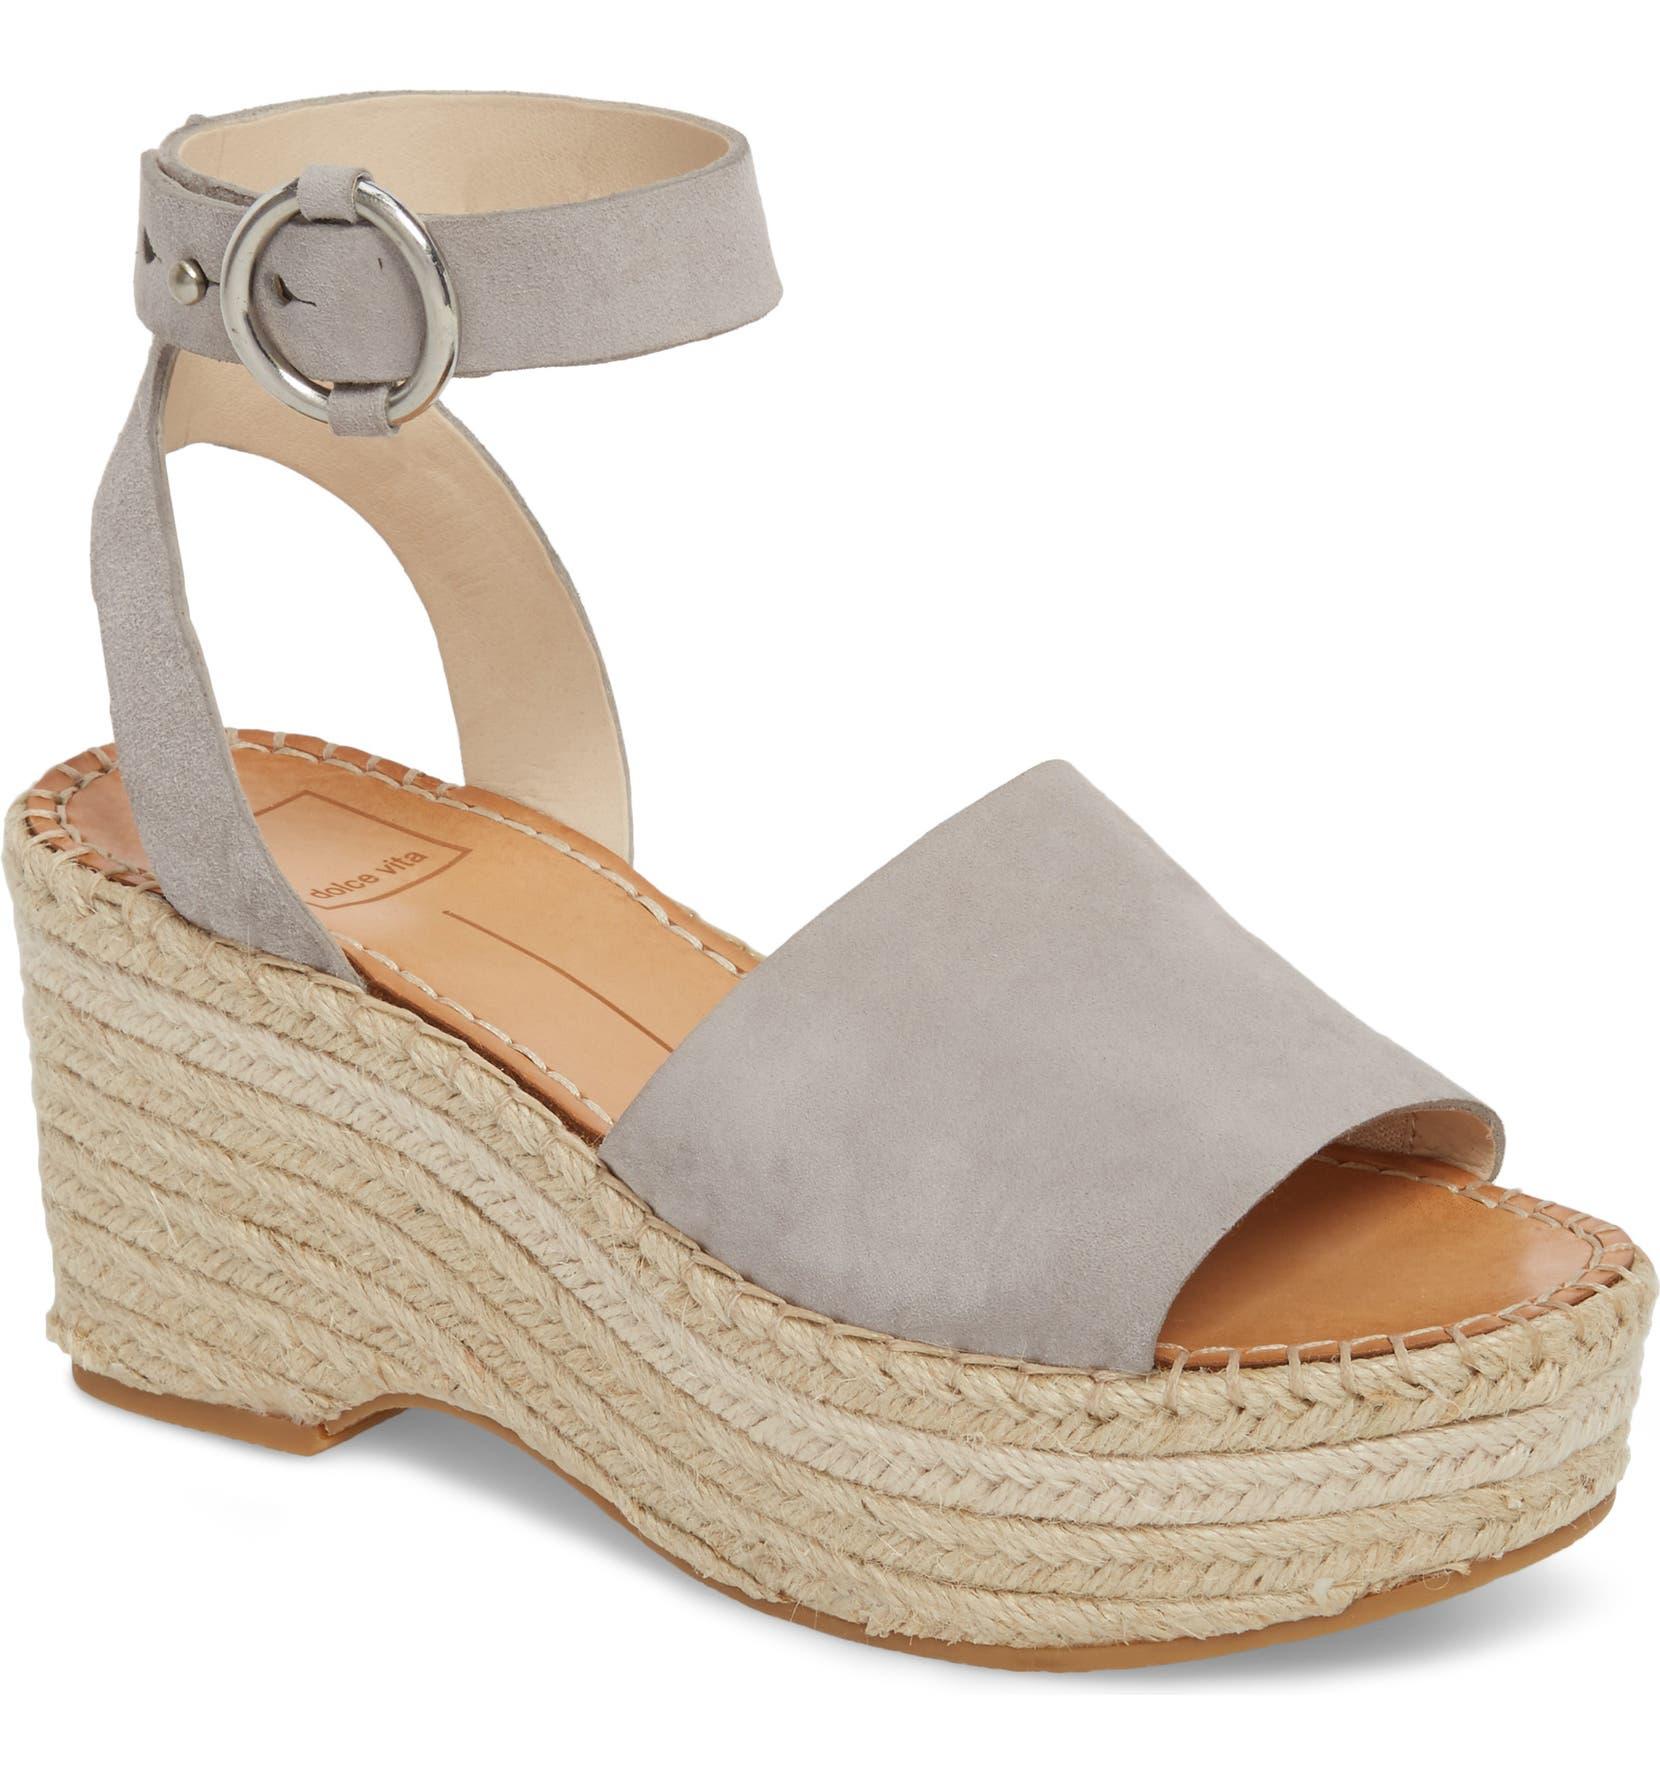 e3d4d85a0b20 Dolce Vita Lesly Espadrille Platform Sandal (Women)